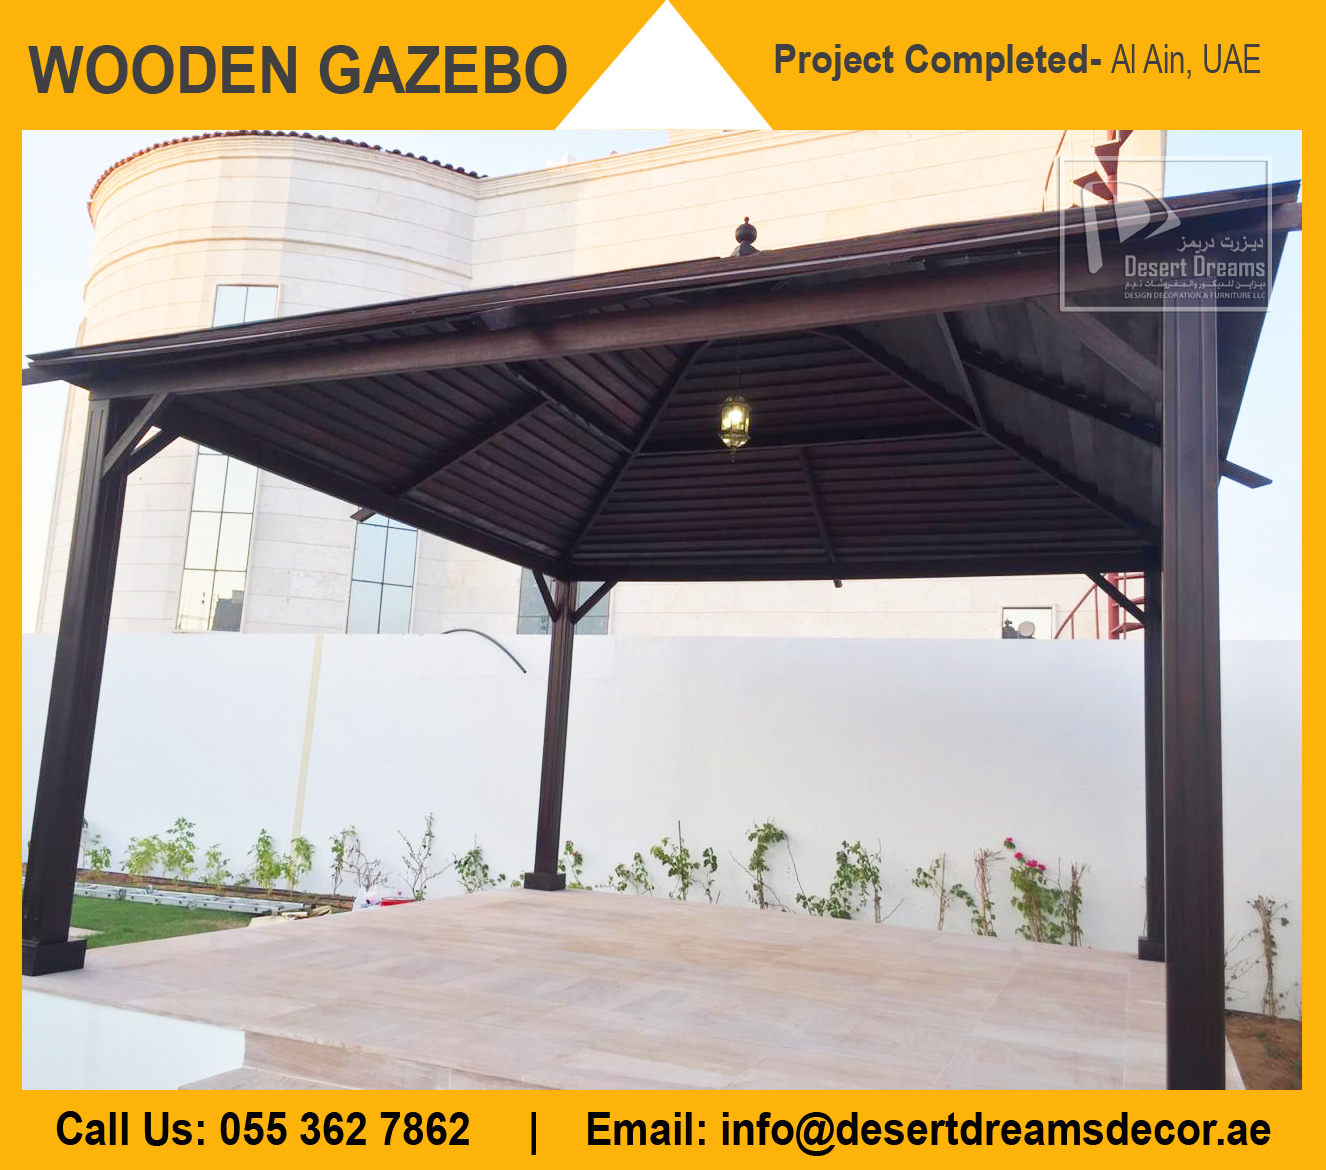 Wooden Gazebo Manufacturing and Installing in UAE_Wooden Gazebo Images_Desert Dreams (4).jpg